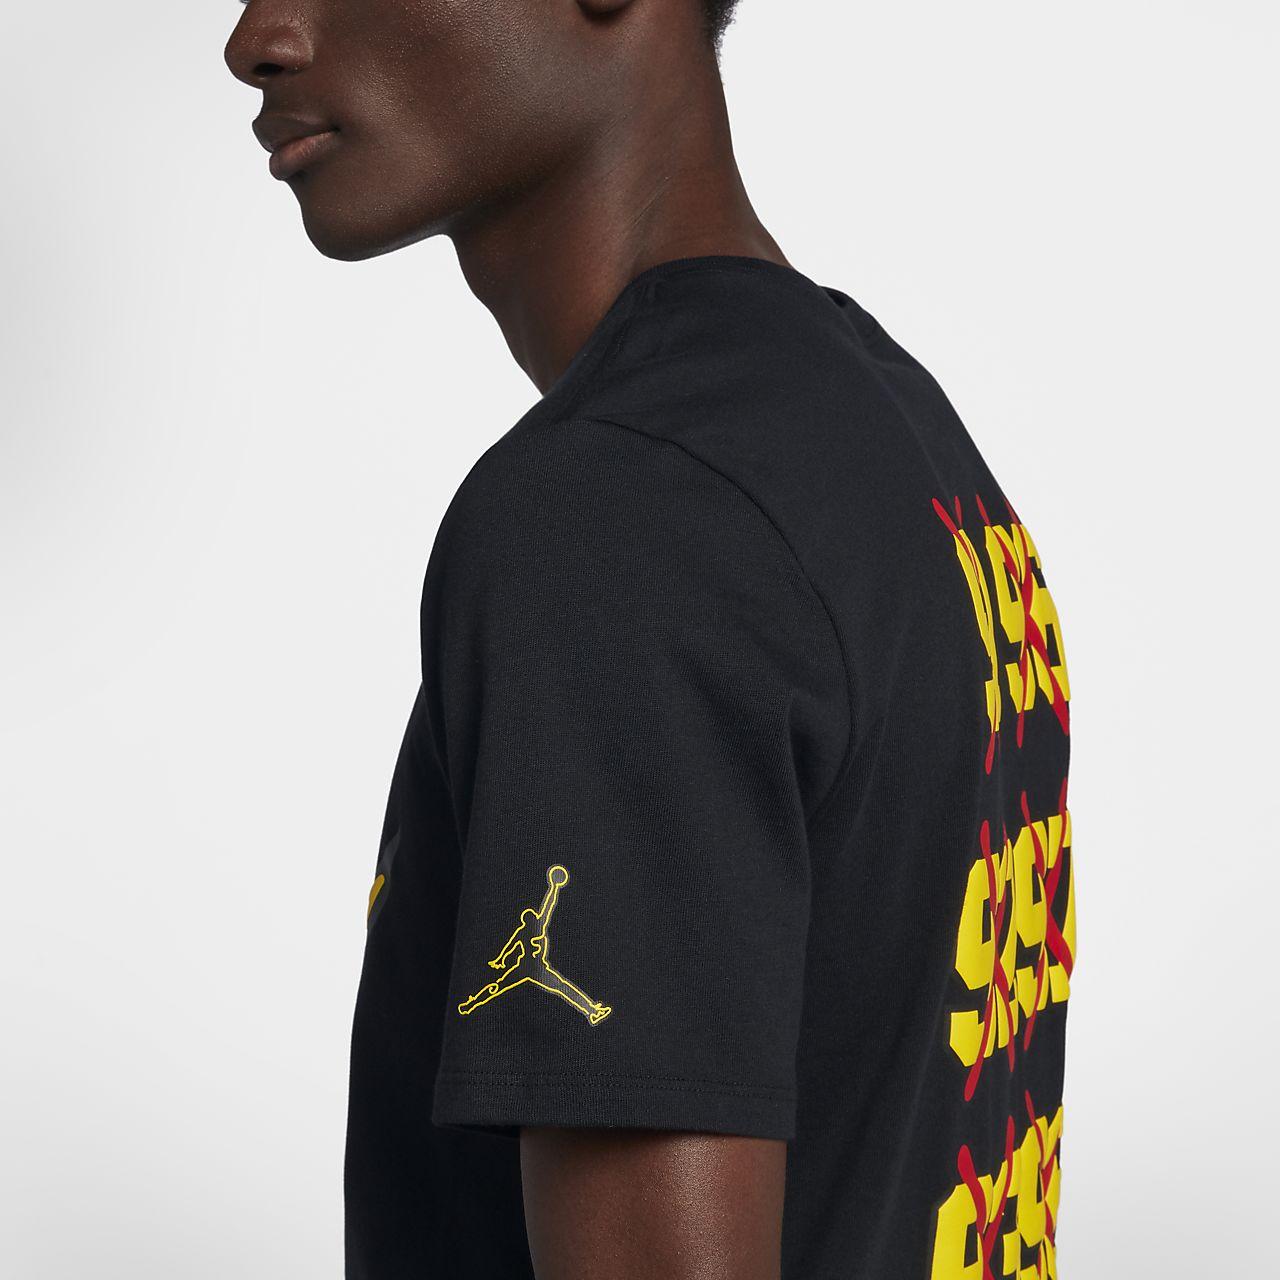 acheter en ligne 77063 35a20 Air Jordan Men's Hockey T-Shirt